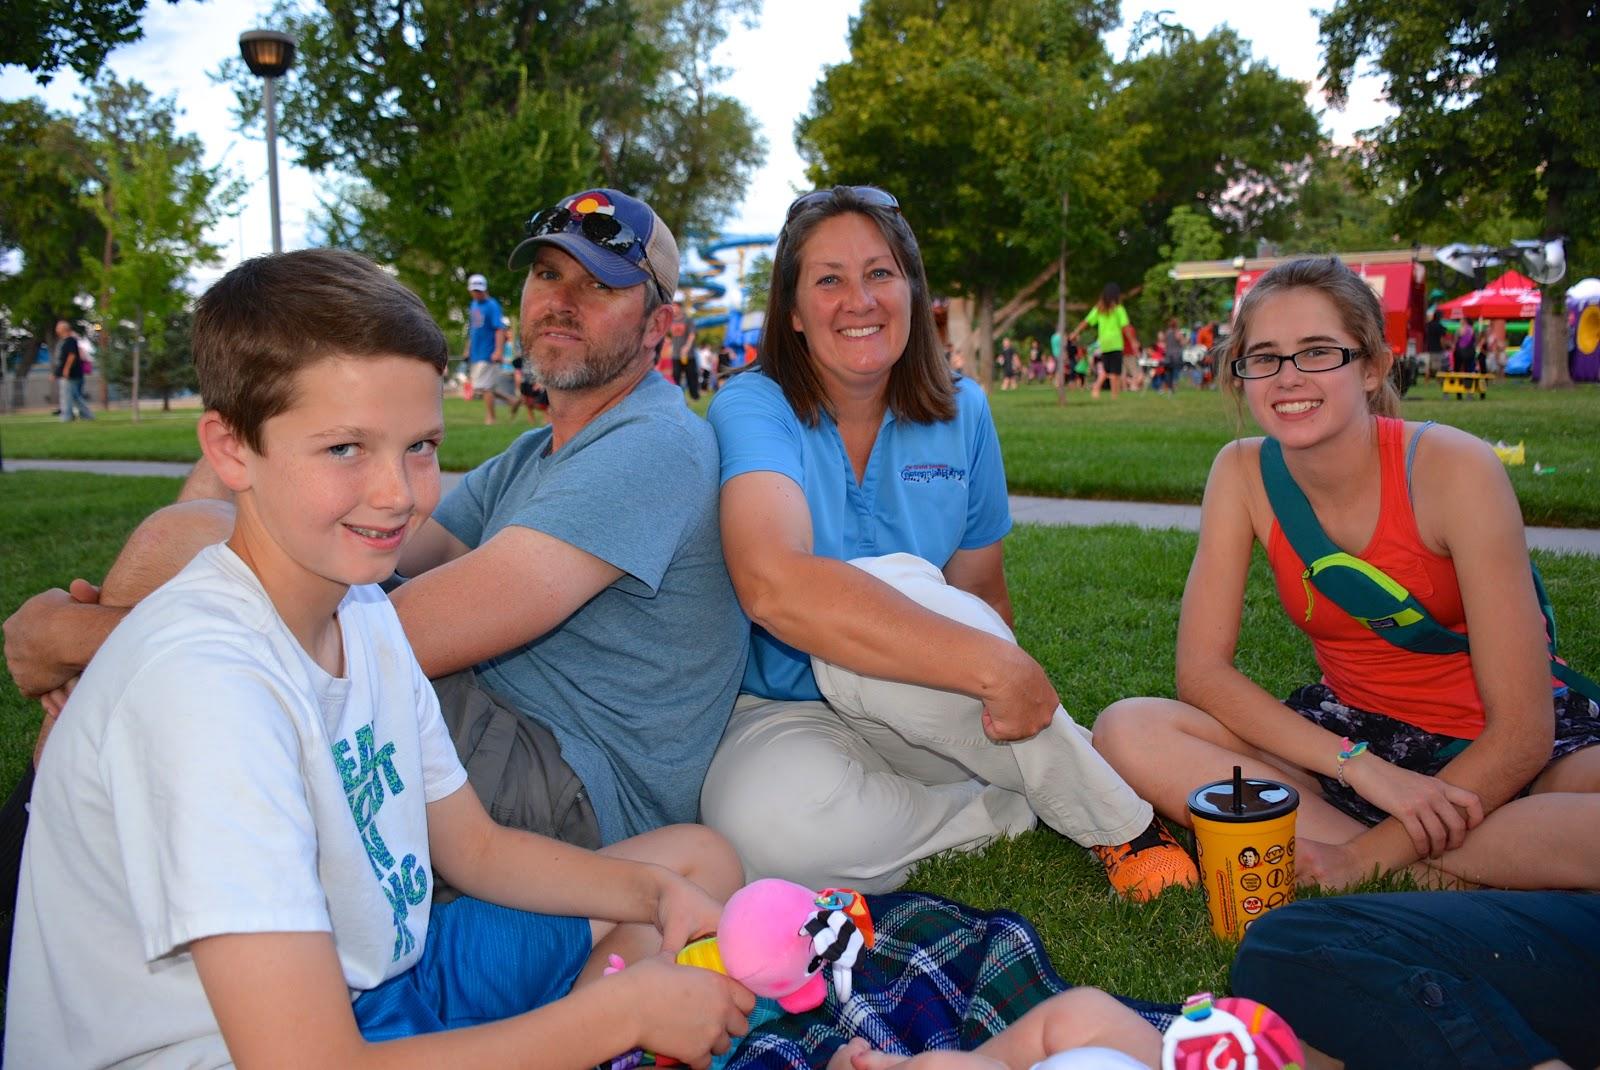 Family at an evening fair